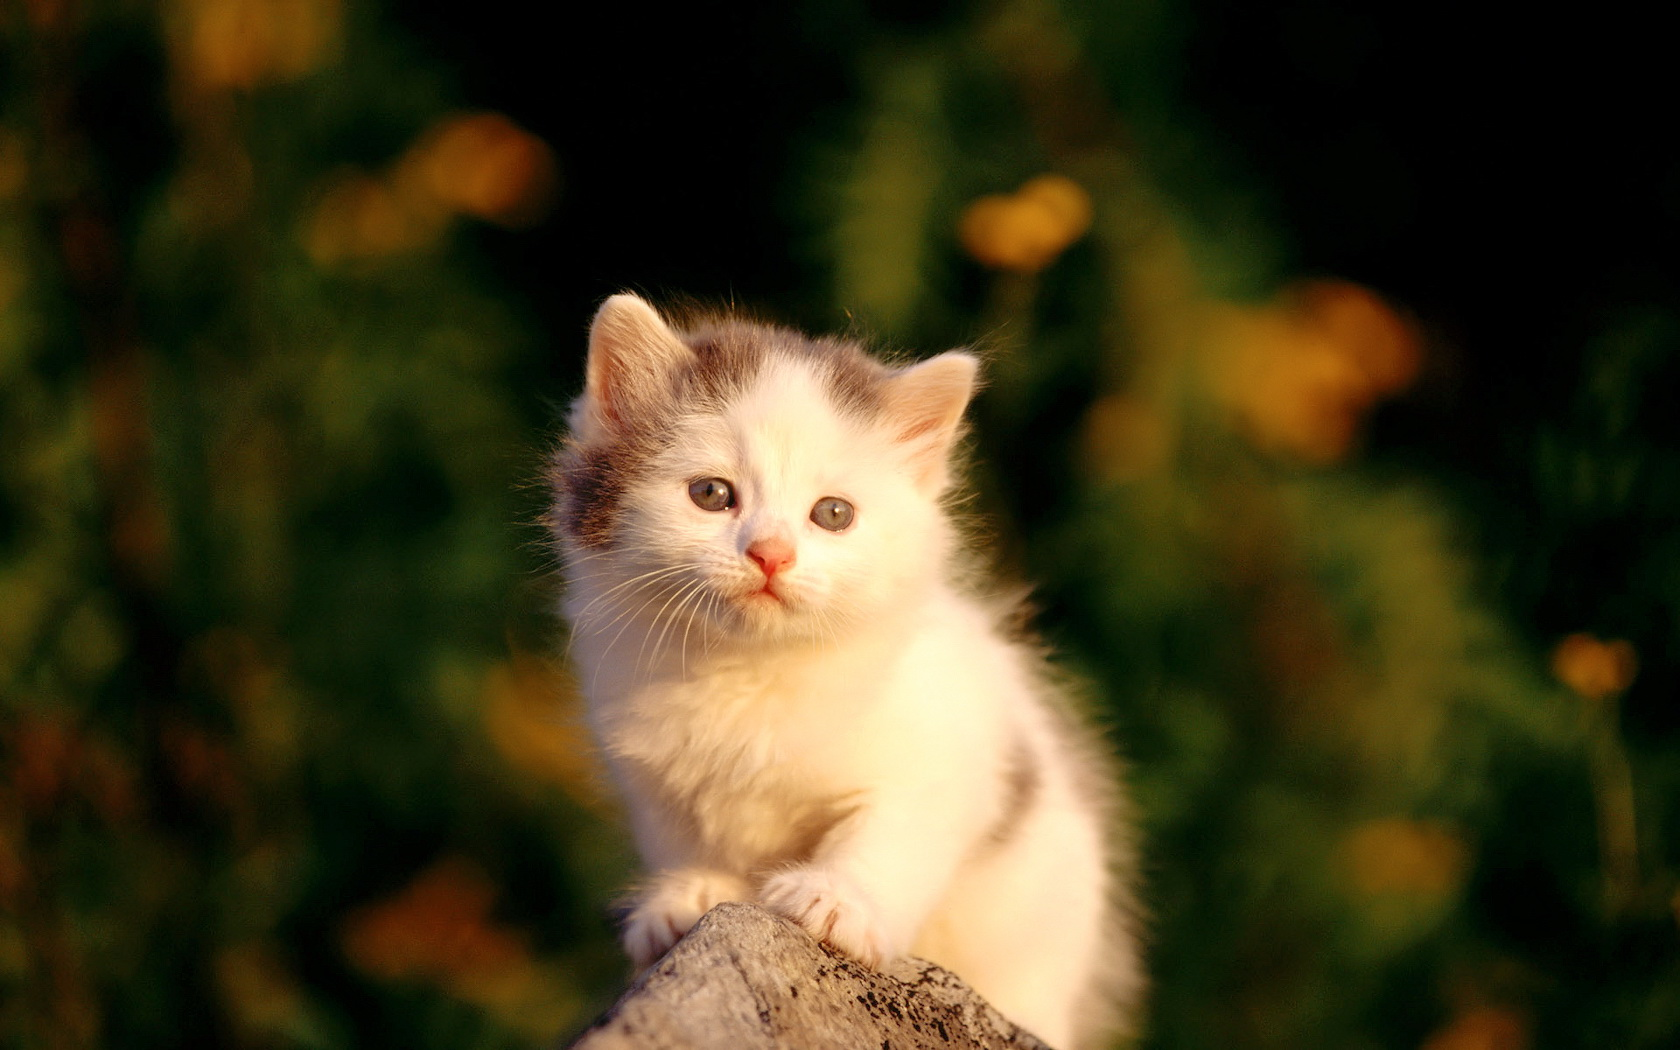 Cute Cats Wallpapers Free Download Hd Desktop Wallpapers 4k Hd